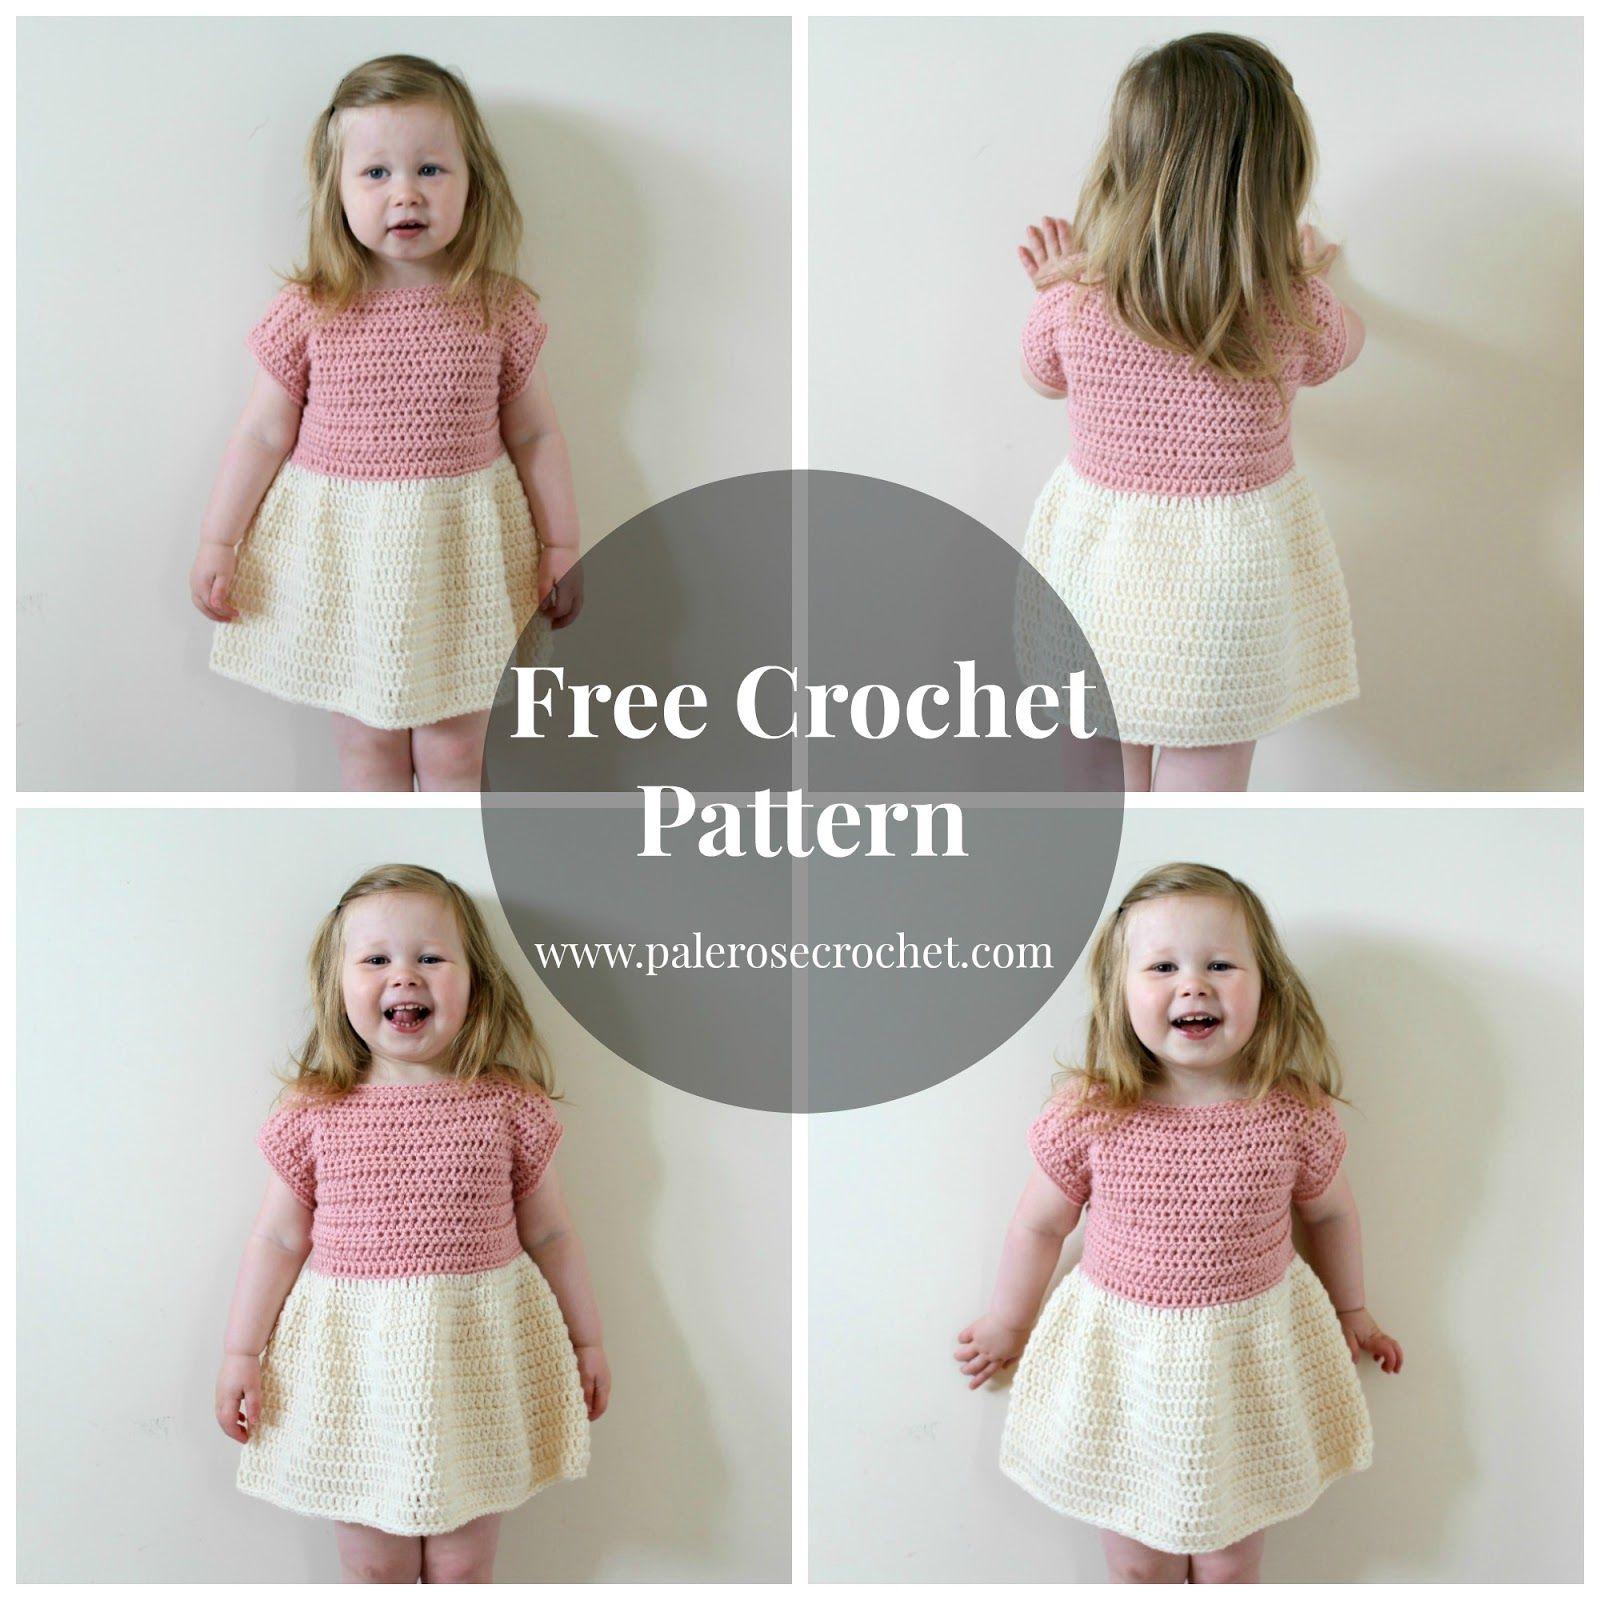 Pale Rose Crochet: Toddler Party Dress Crochet Pattern | Crochet ...